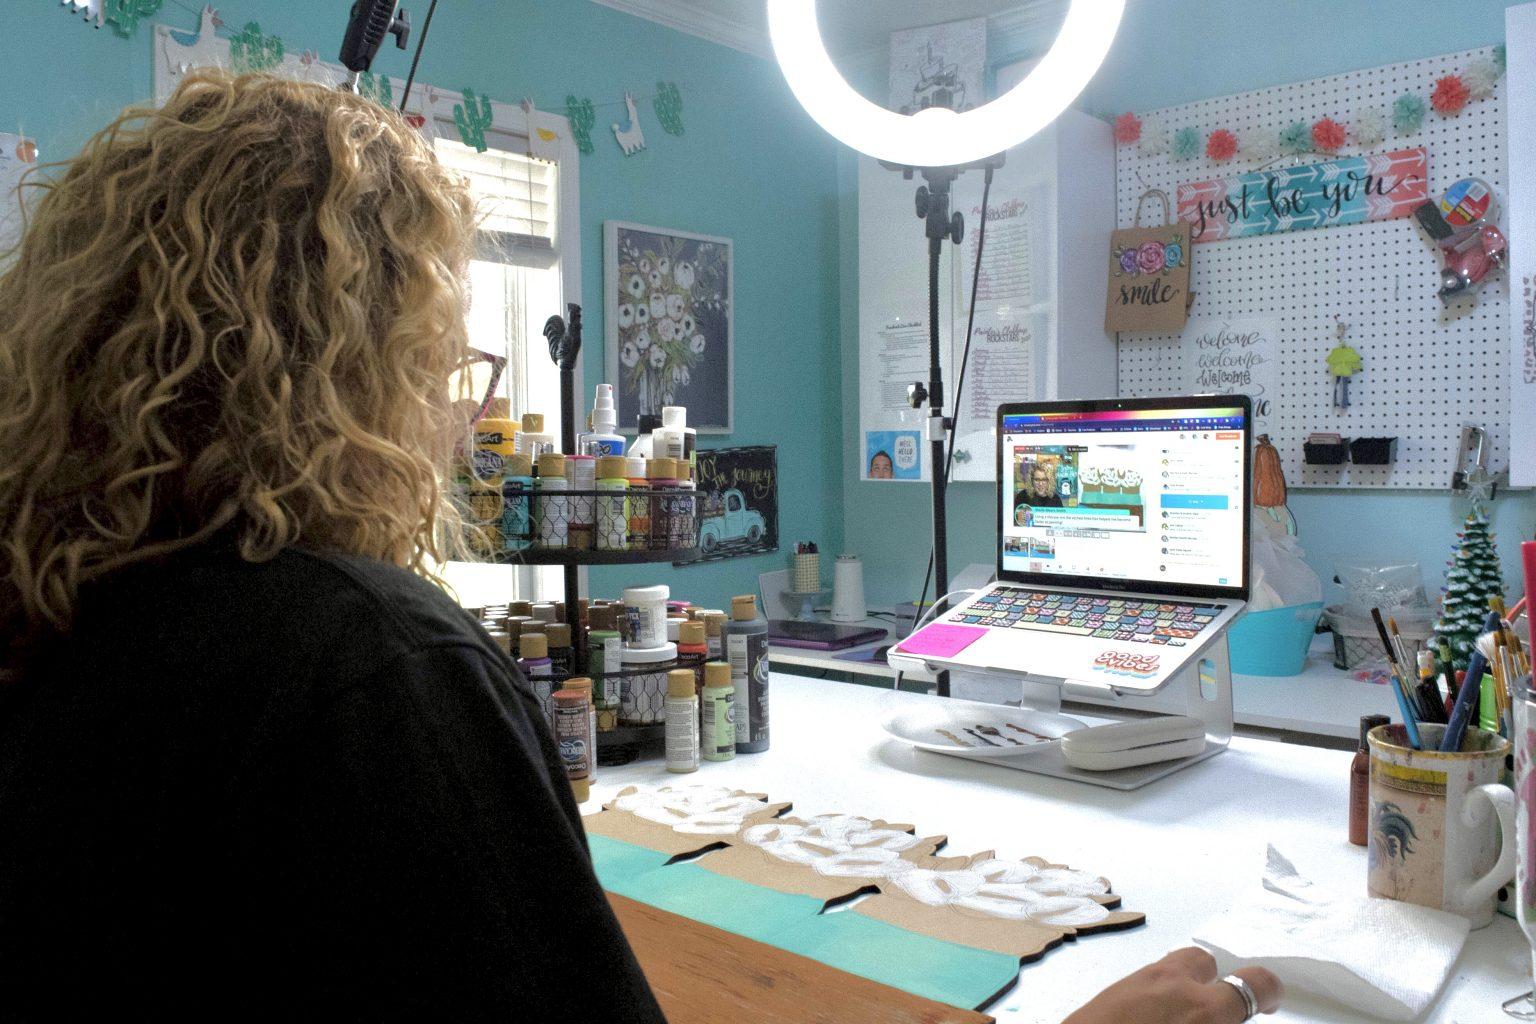 Tamara Bennett sitting behind a computer and ring light on Facebook